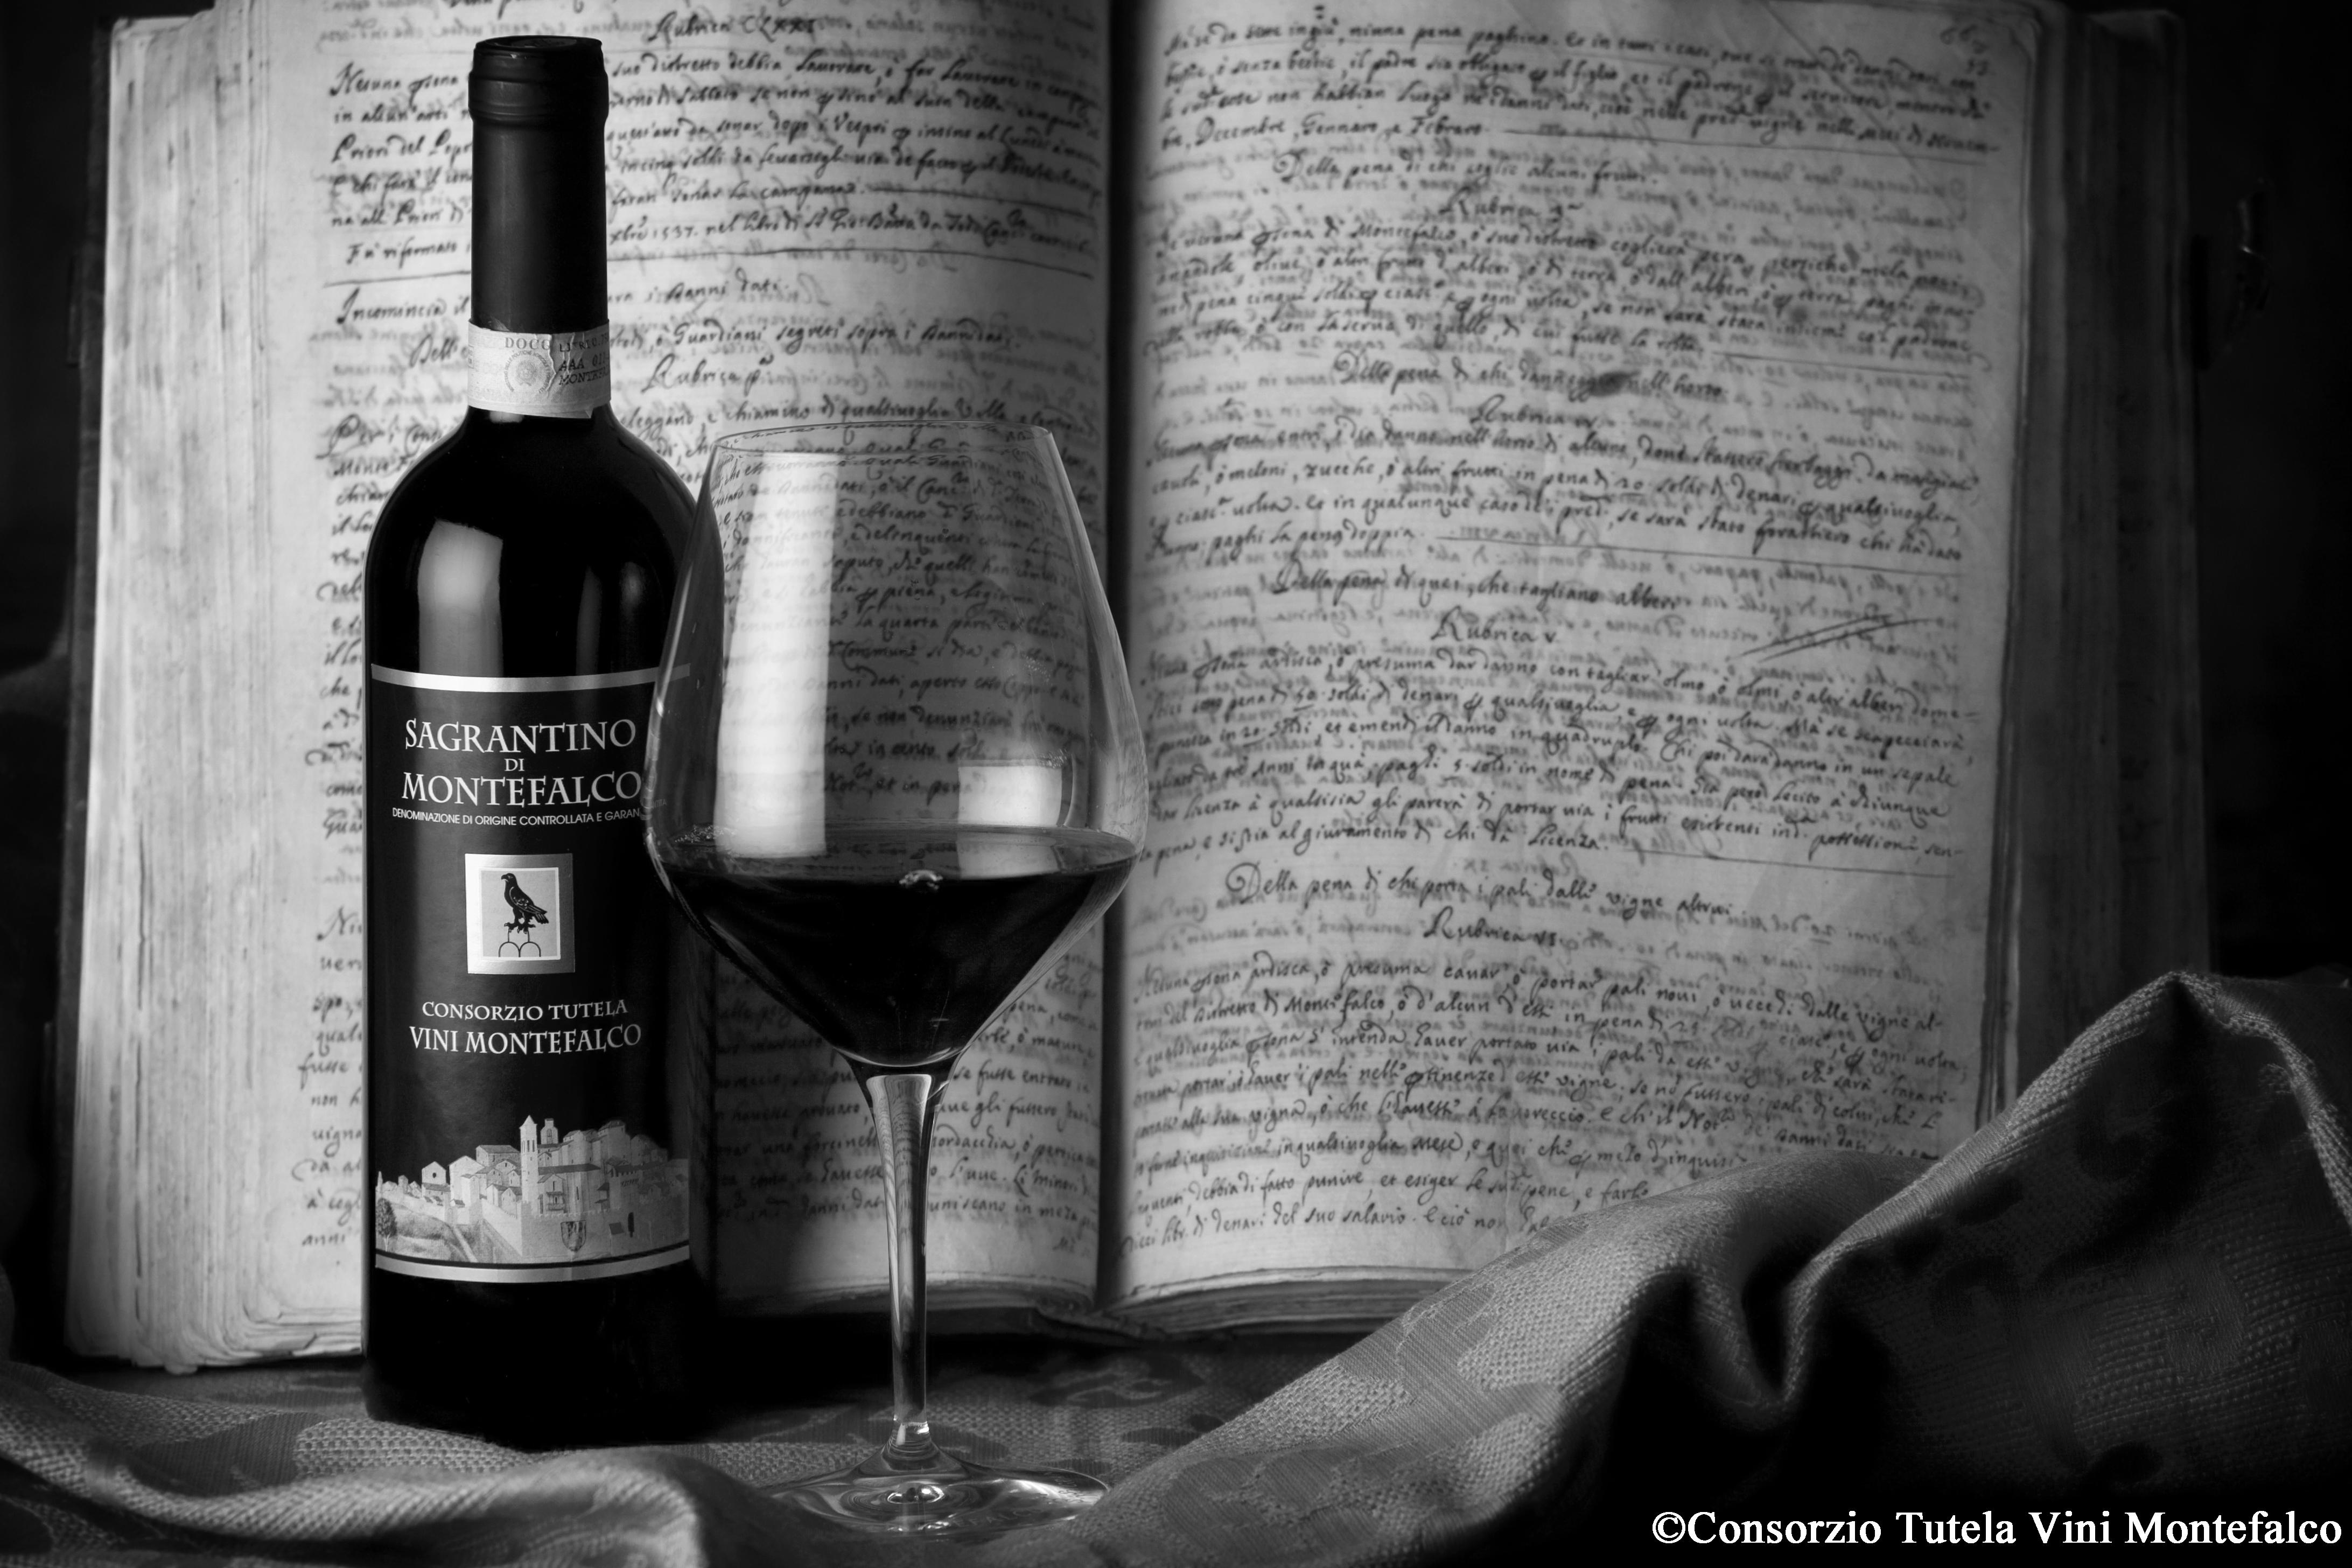 (re)discovering Sagrantino photo